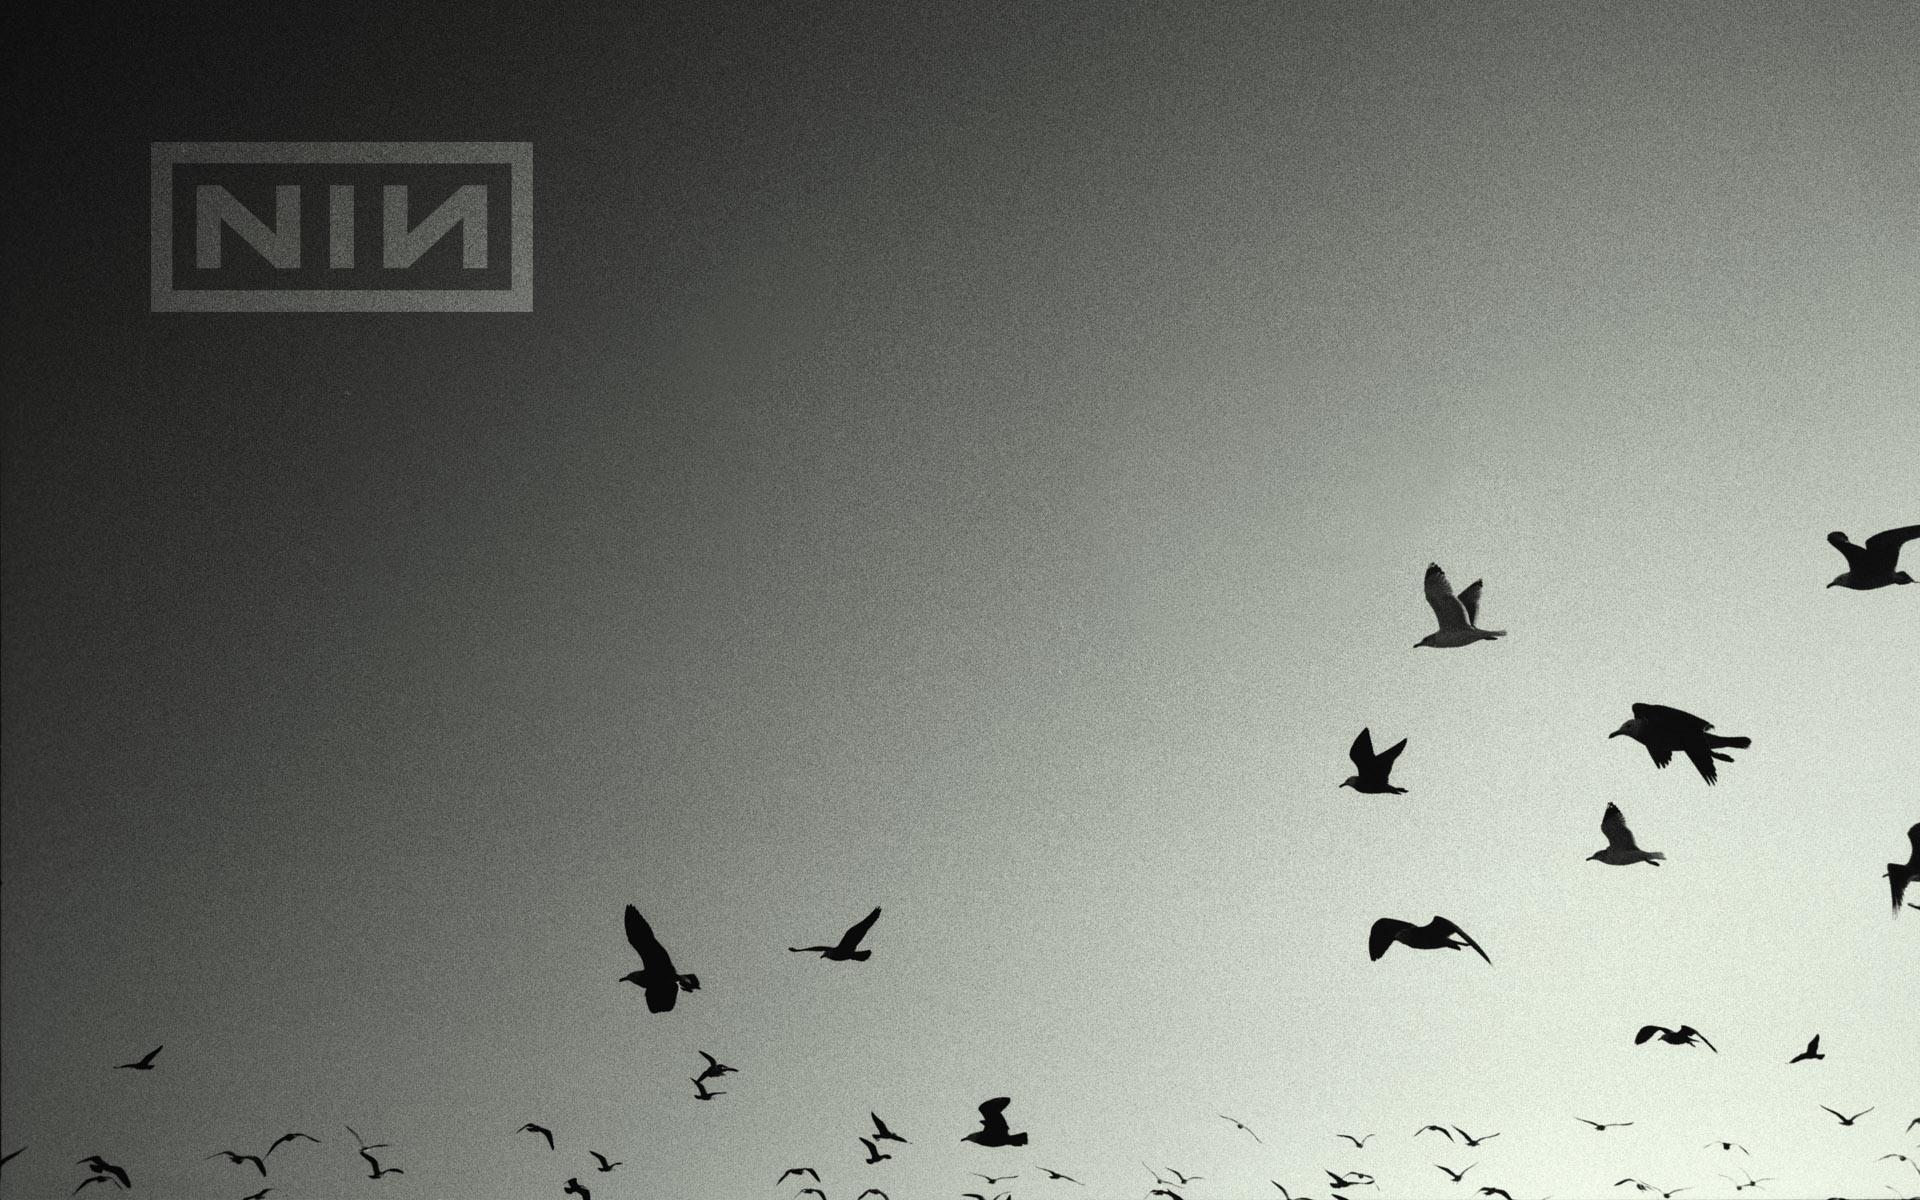 Nine Inch Nails desktop wallpaper